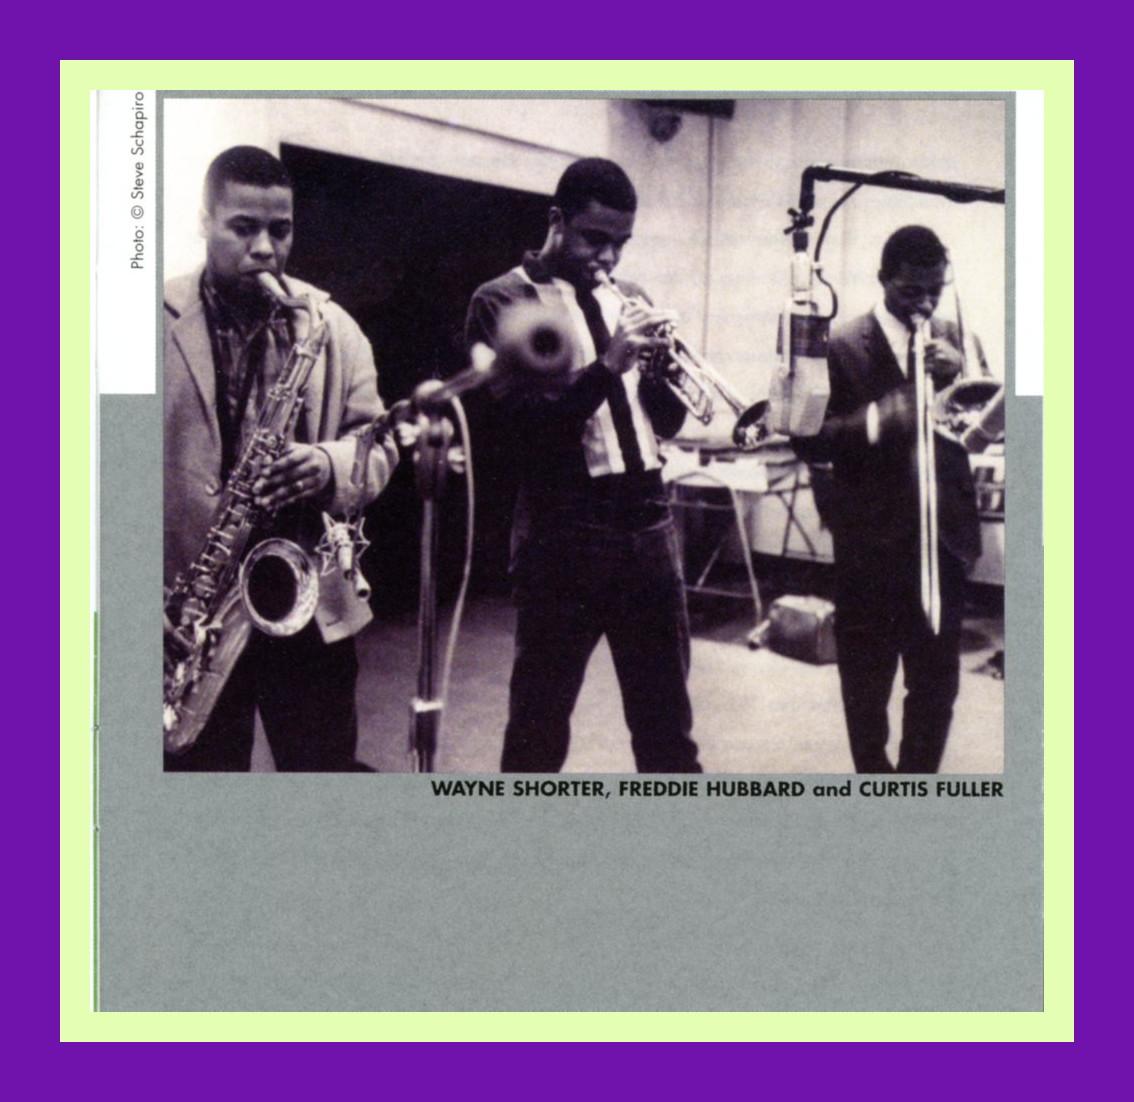 <Los 250 discos de jazz que debes escuchar> 4. The Trumpet Summit Meets the Oscar Peterson Big 4 - Página 3 Art%2BBlakey%2BCaravan%2B006